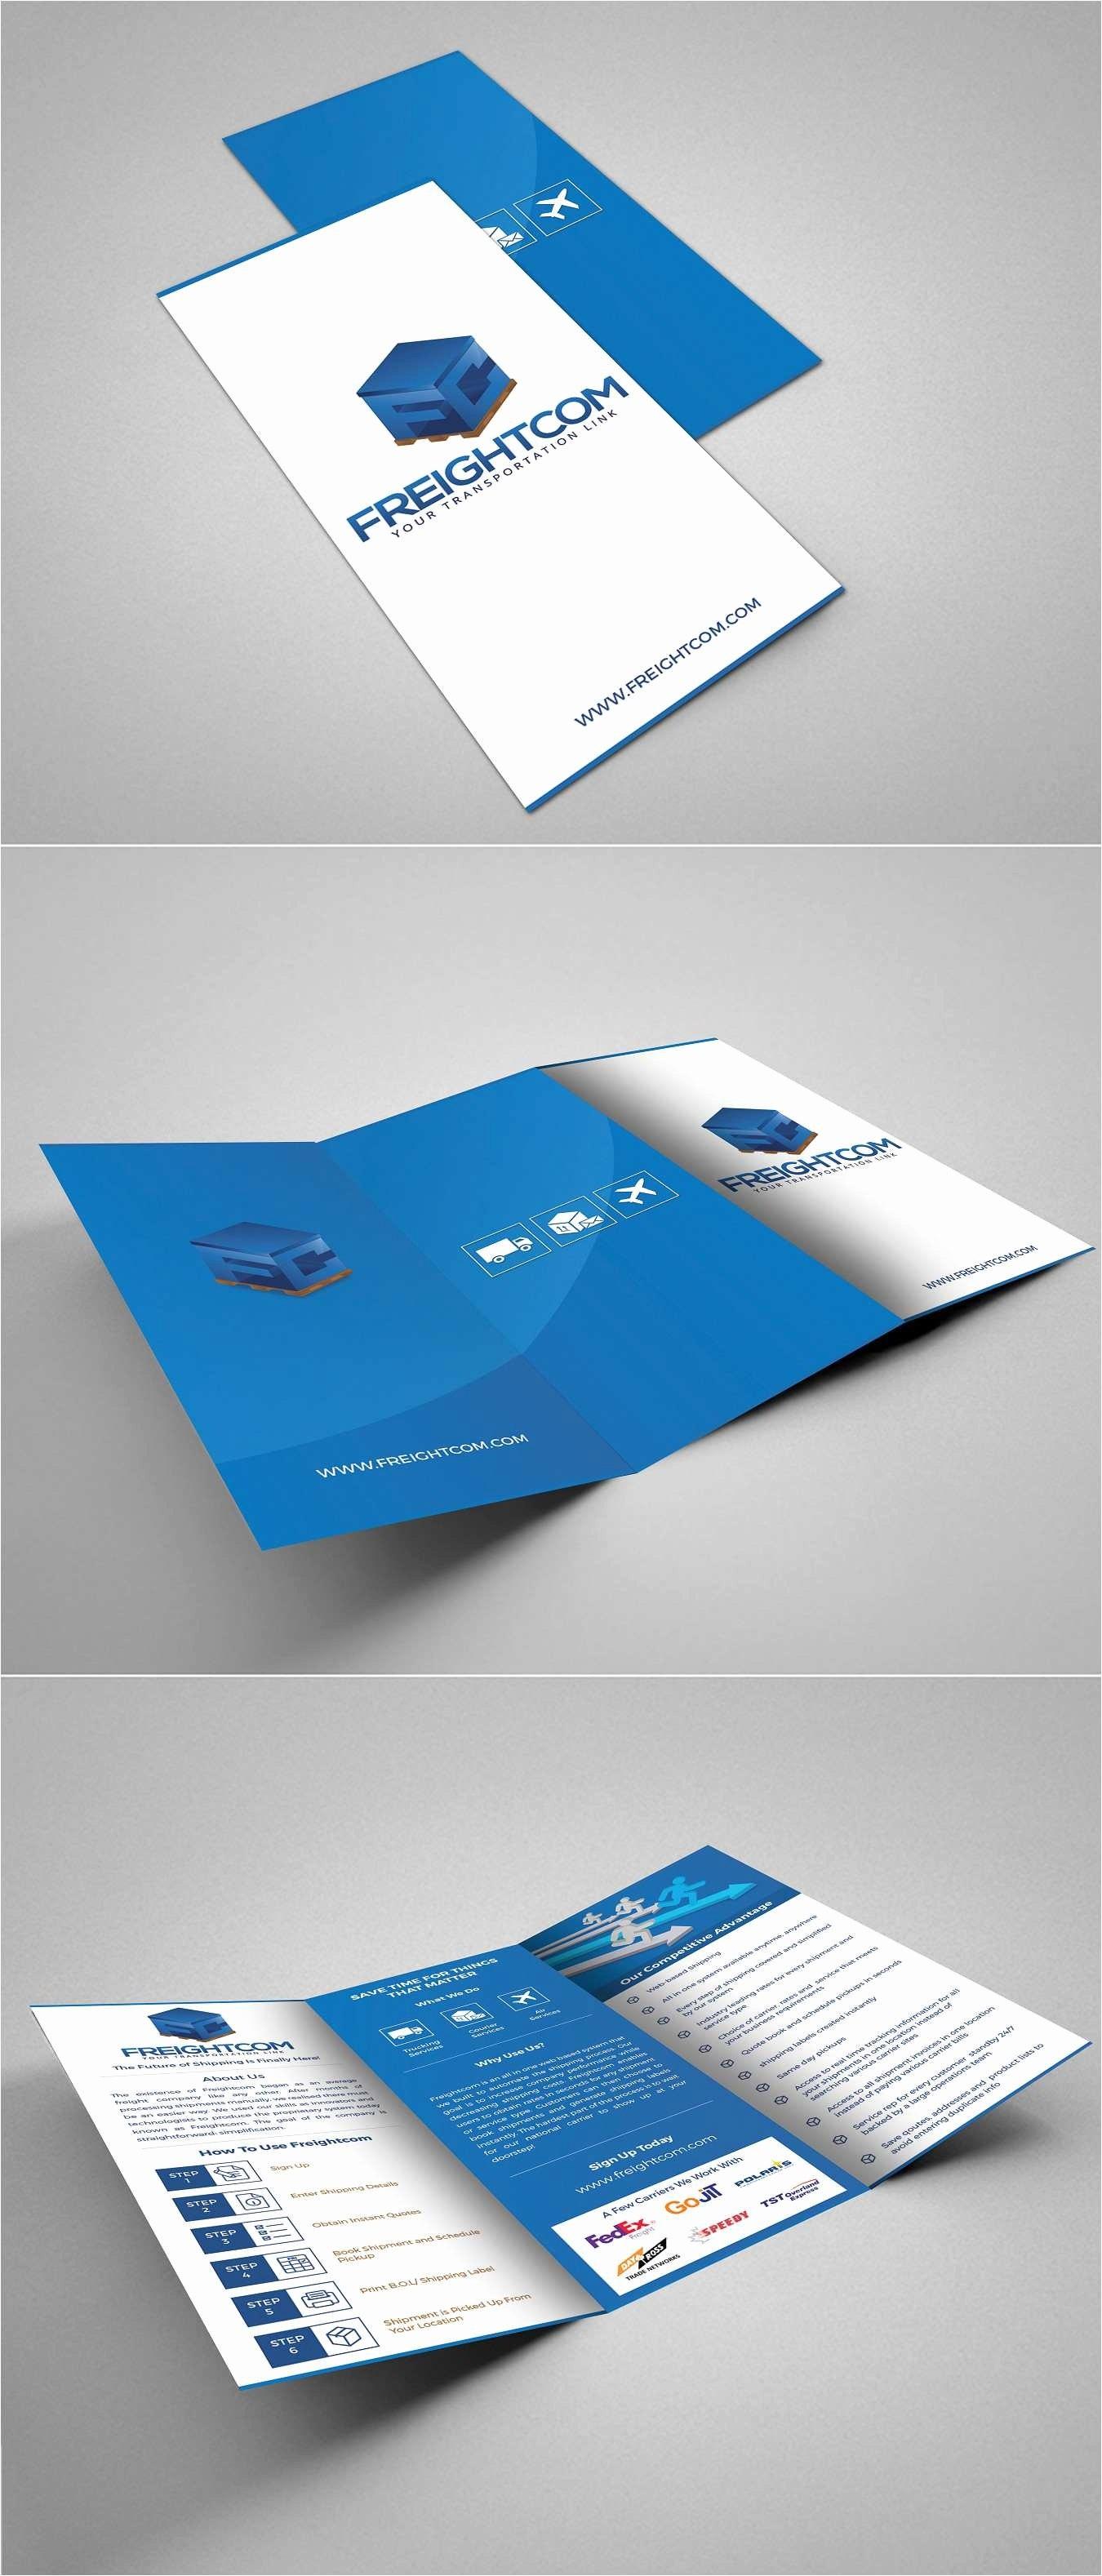 Fed Ex Kinkos Business Cards New Fedex Fice Business Cards Fedex Throughout Fedex Brochure Template